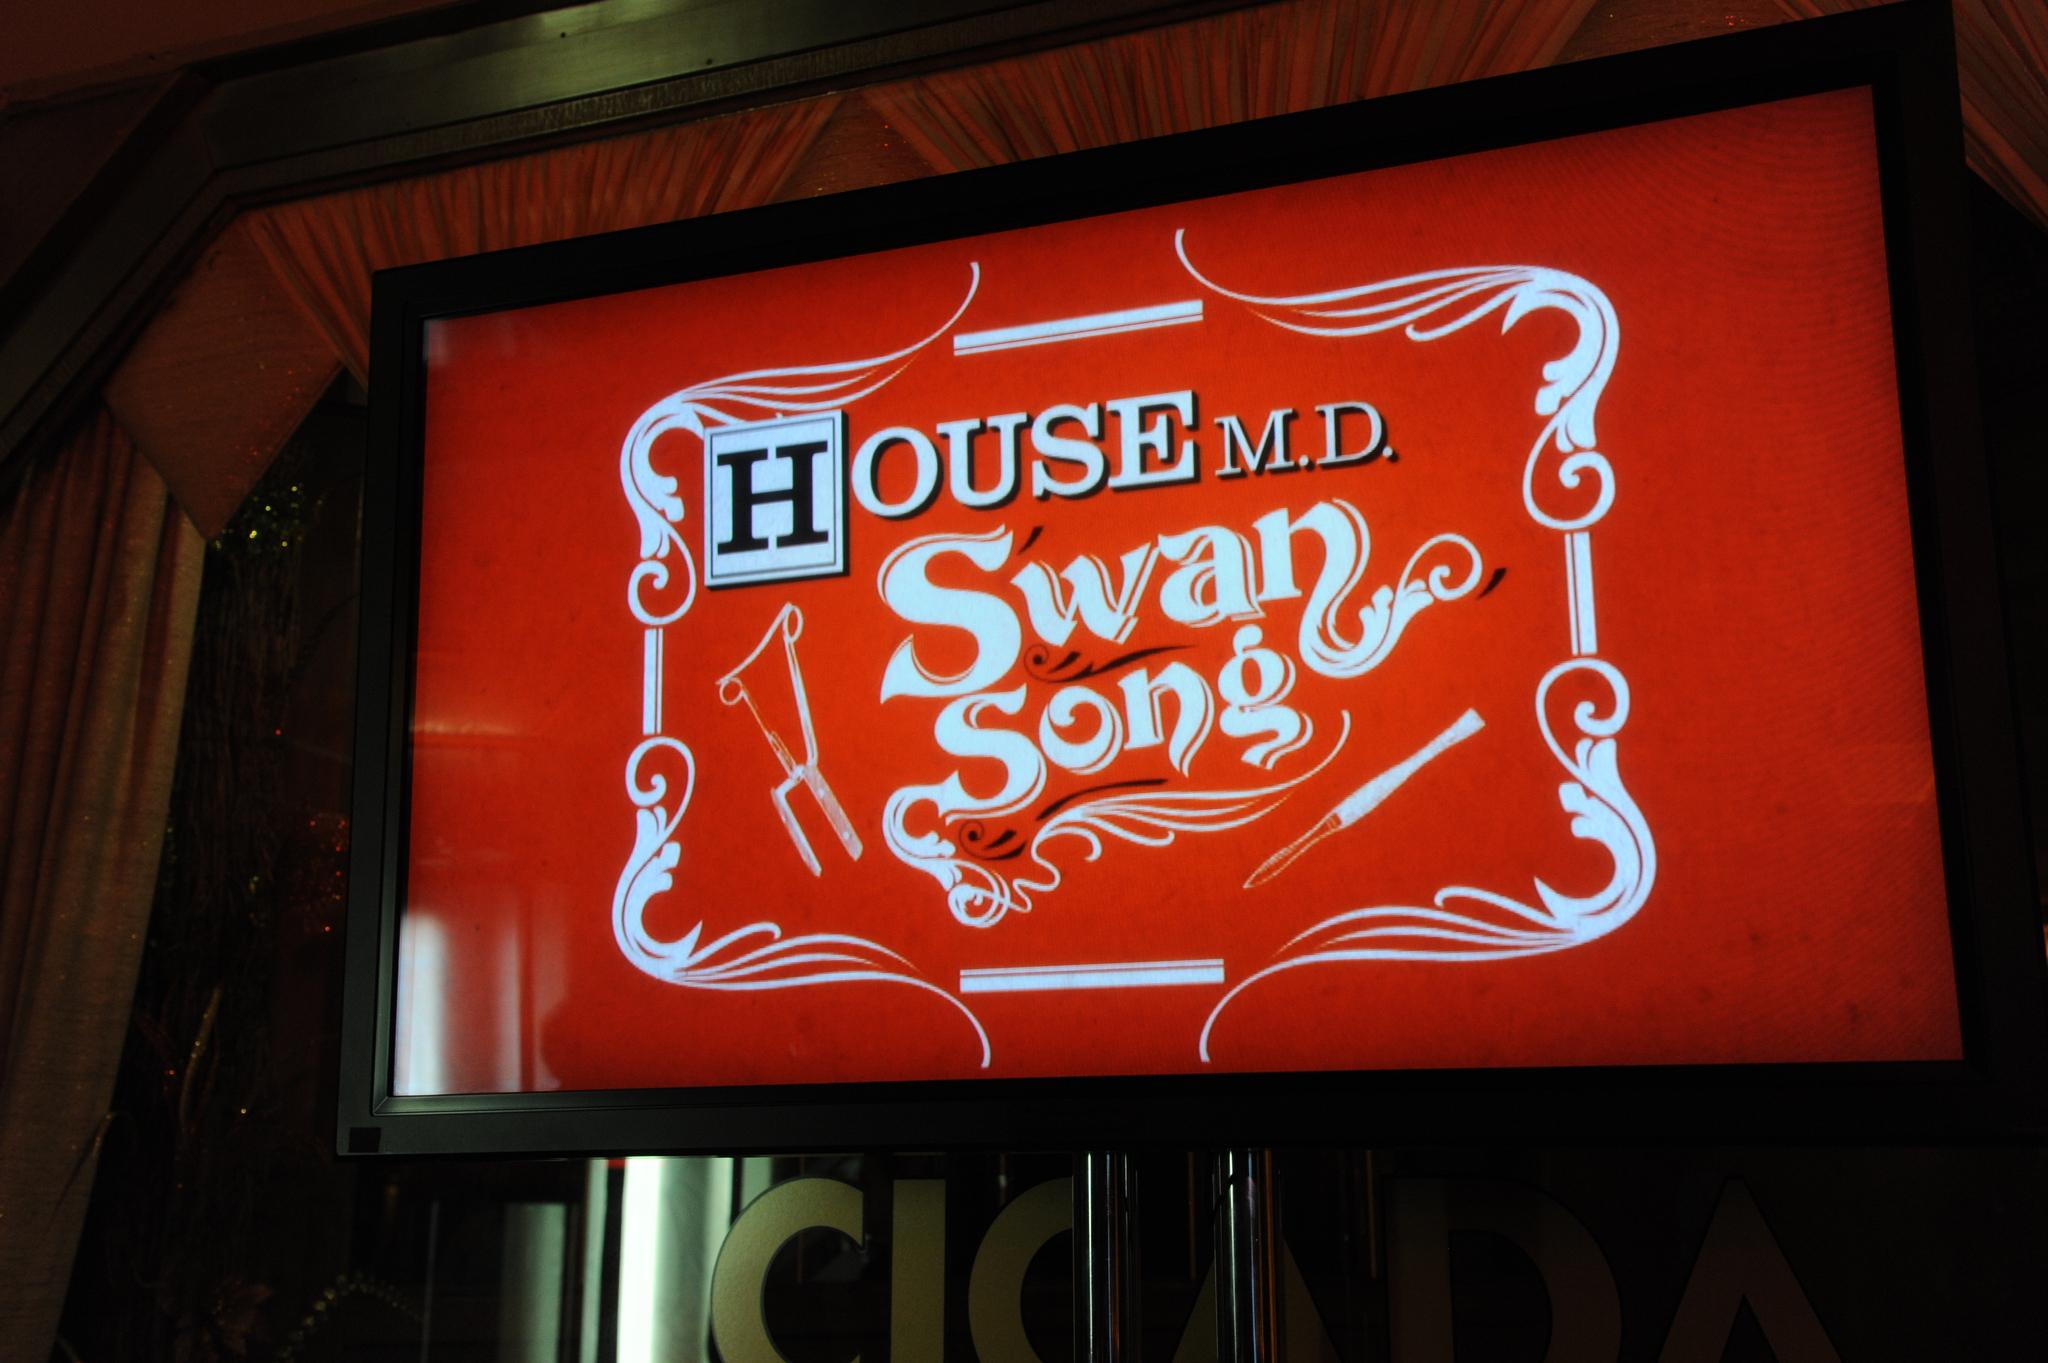 House-M-D-Series-Wrap-Party-April-20-2012-house-md-30554237-2048-1363.jpg